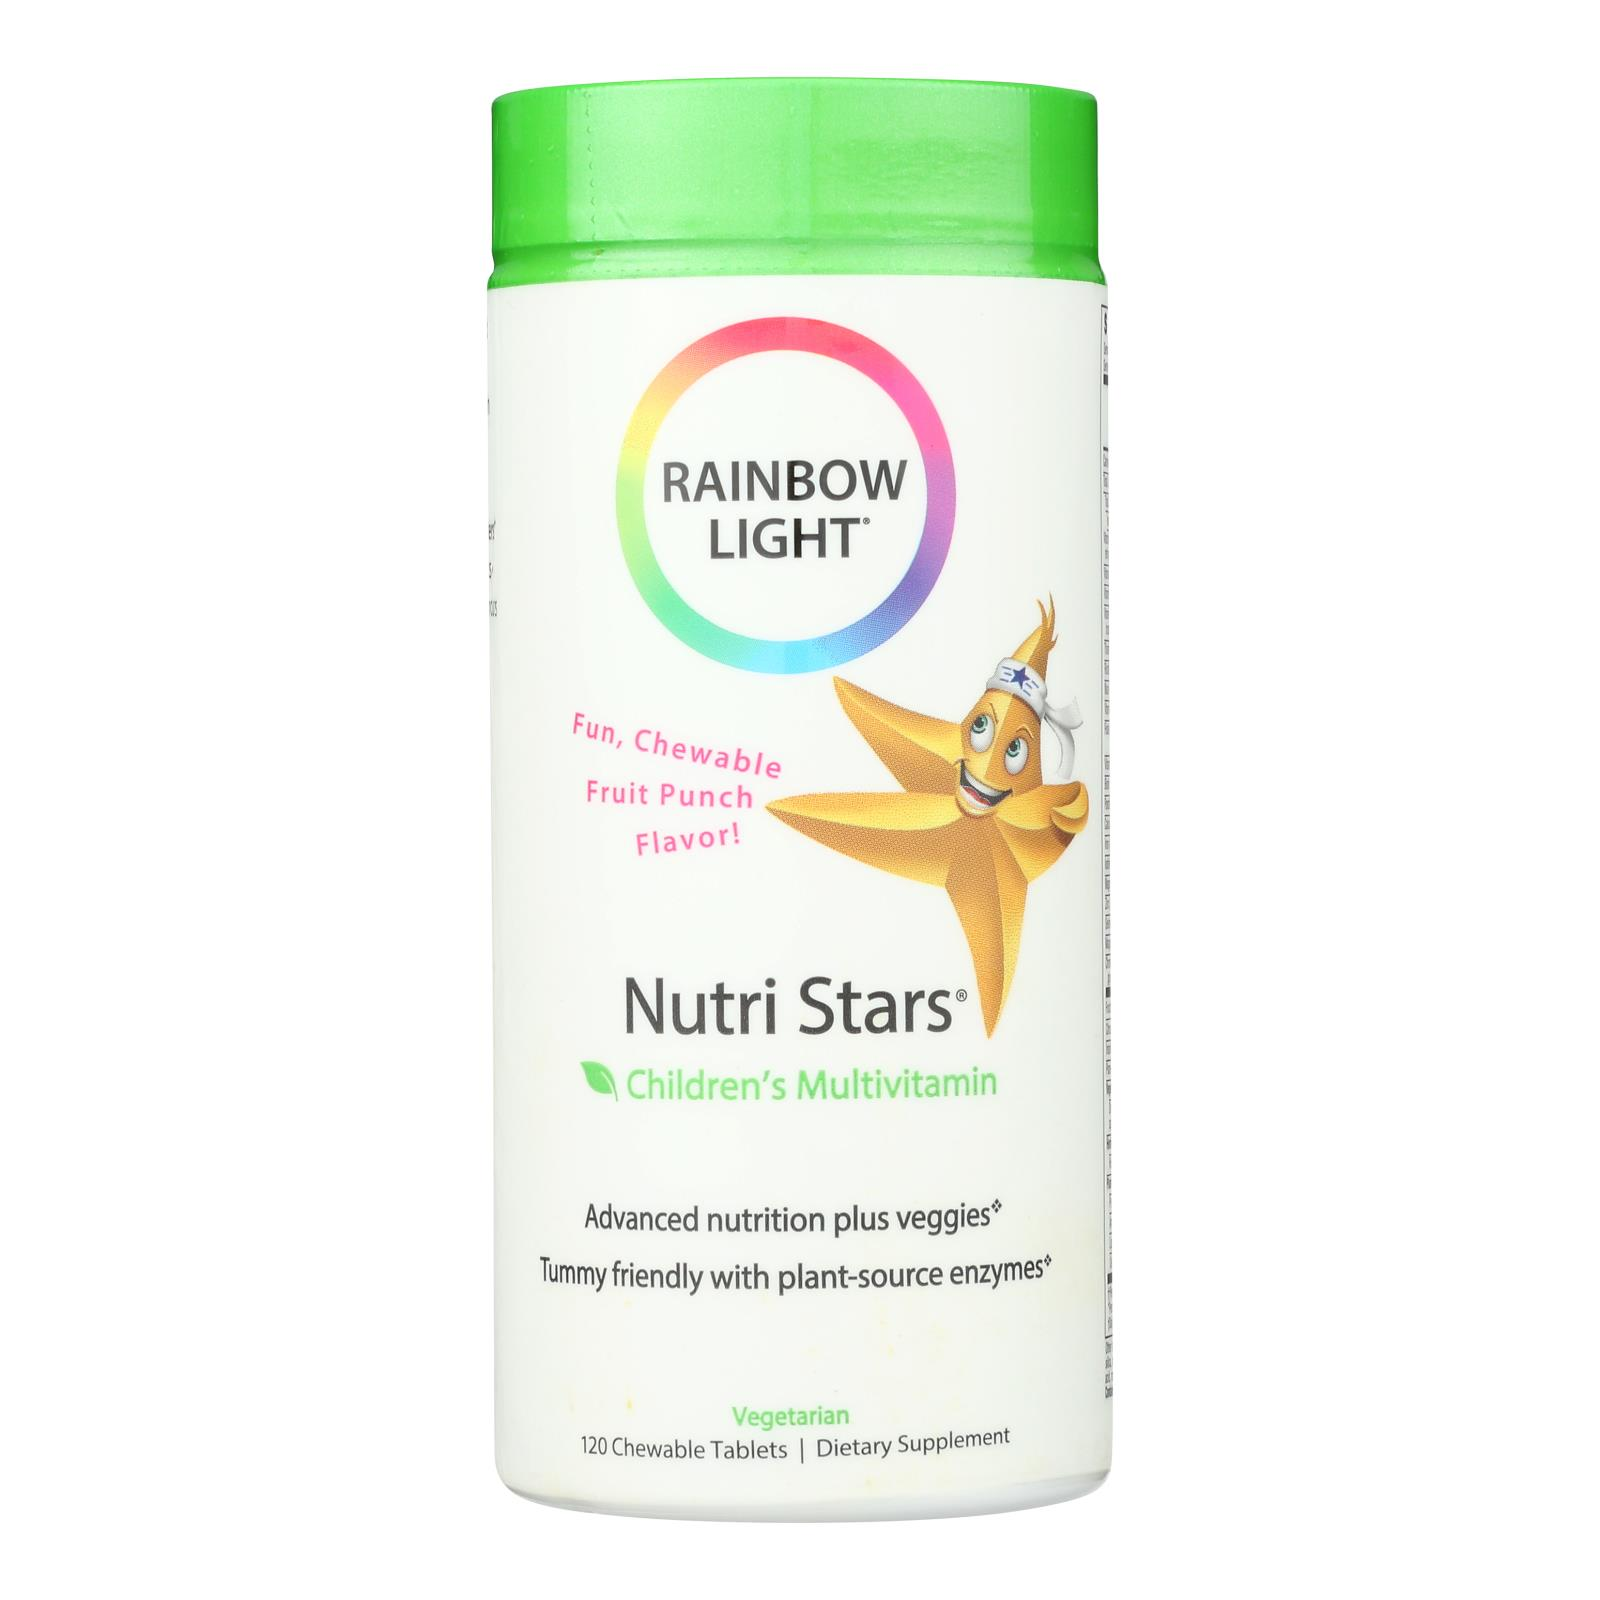 Rainbow Light NutriStars Delicious Fruit Blast - 120 Chewable Tablets